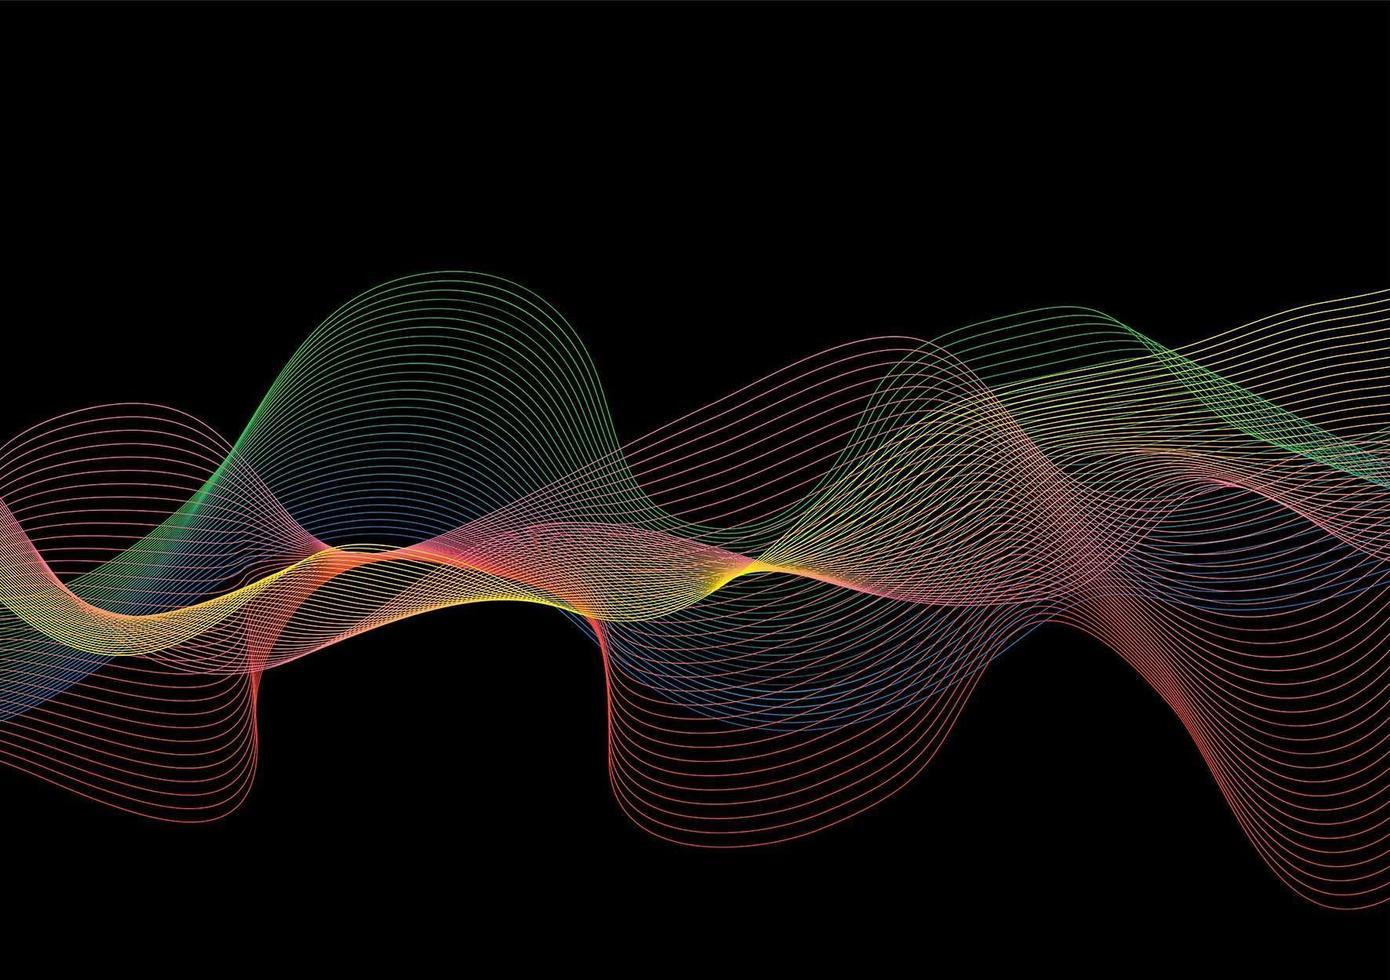 abstracte moderne achtergrond vector